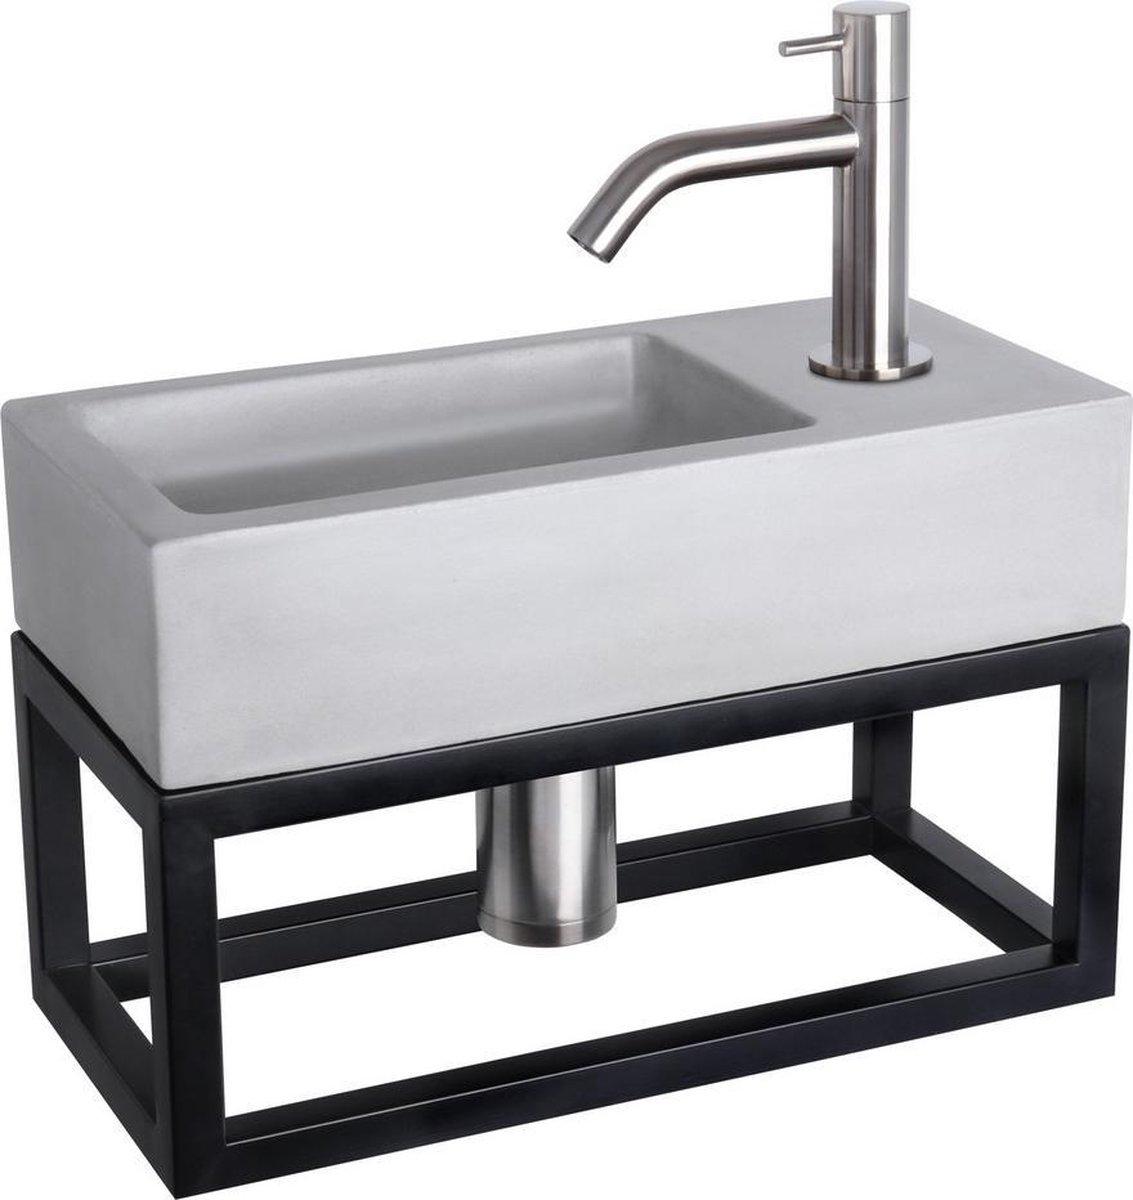 Differnz Ravo Fonteinset - Beton lichtgrijs - Kraan gebogen mat chroom - Met handdoekrek - 38.5 x 18.5 x 9 cm